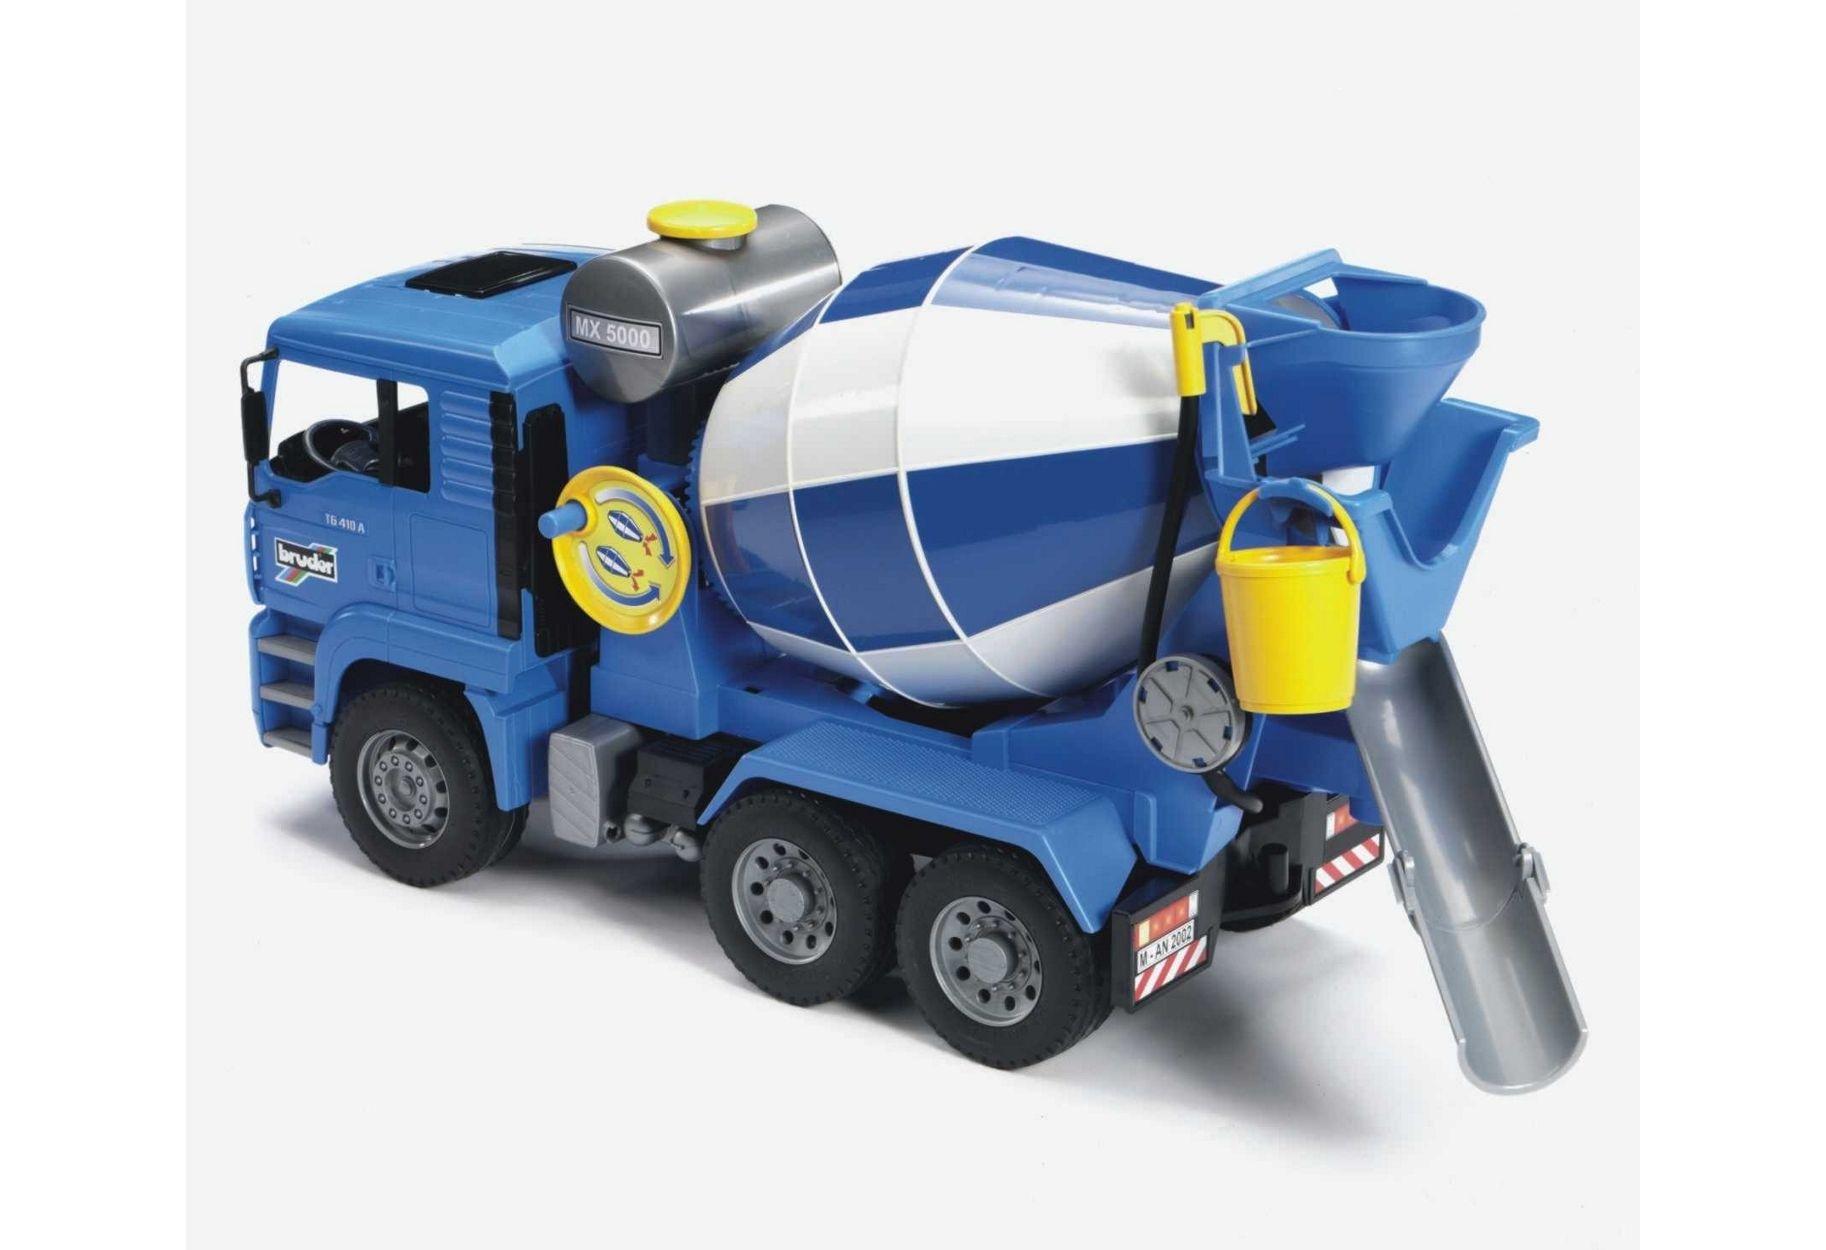 Image of Bruder 02744 MAN TGA Cement Mixer.